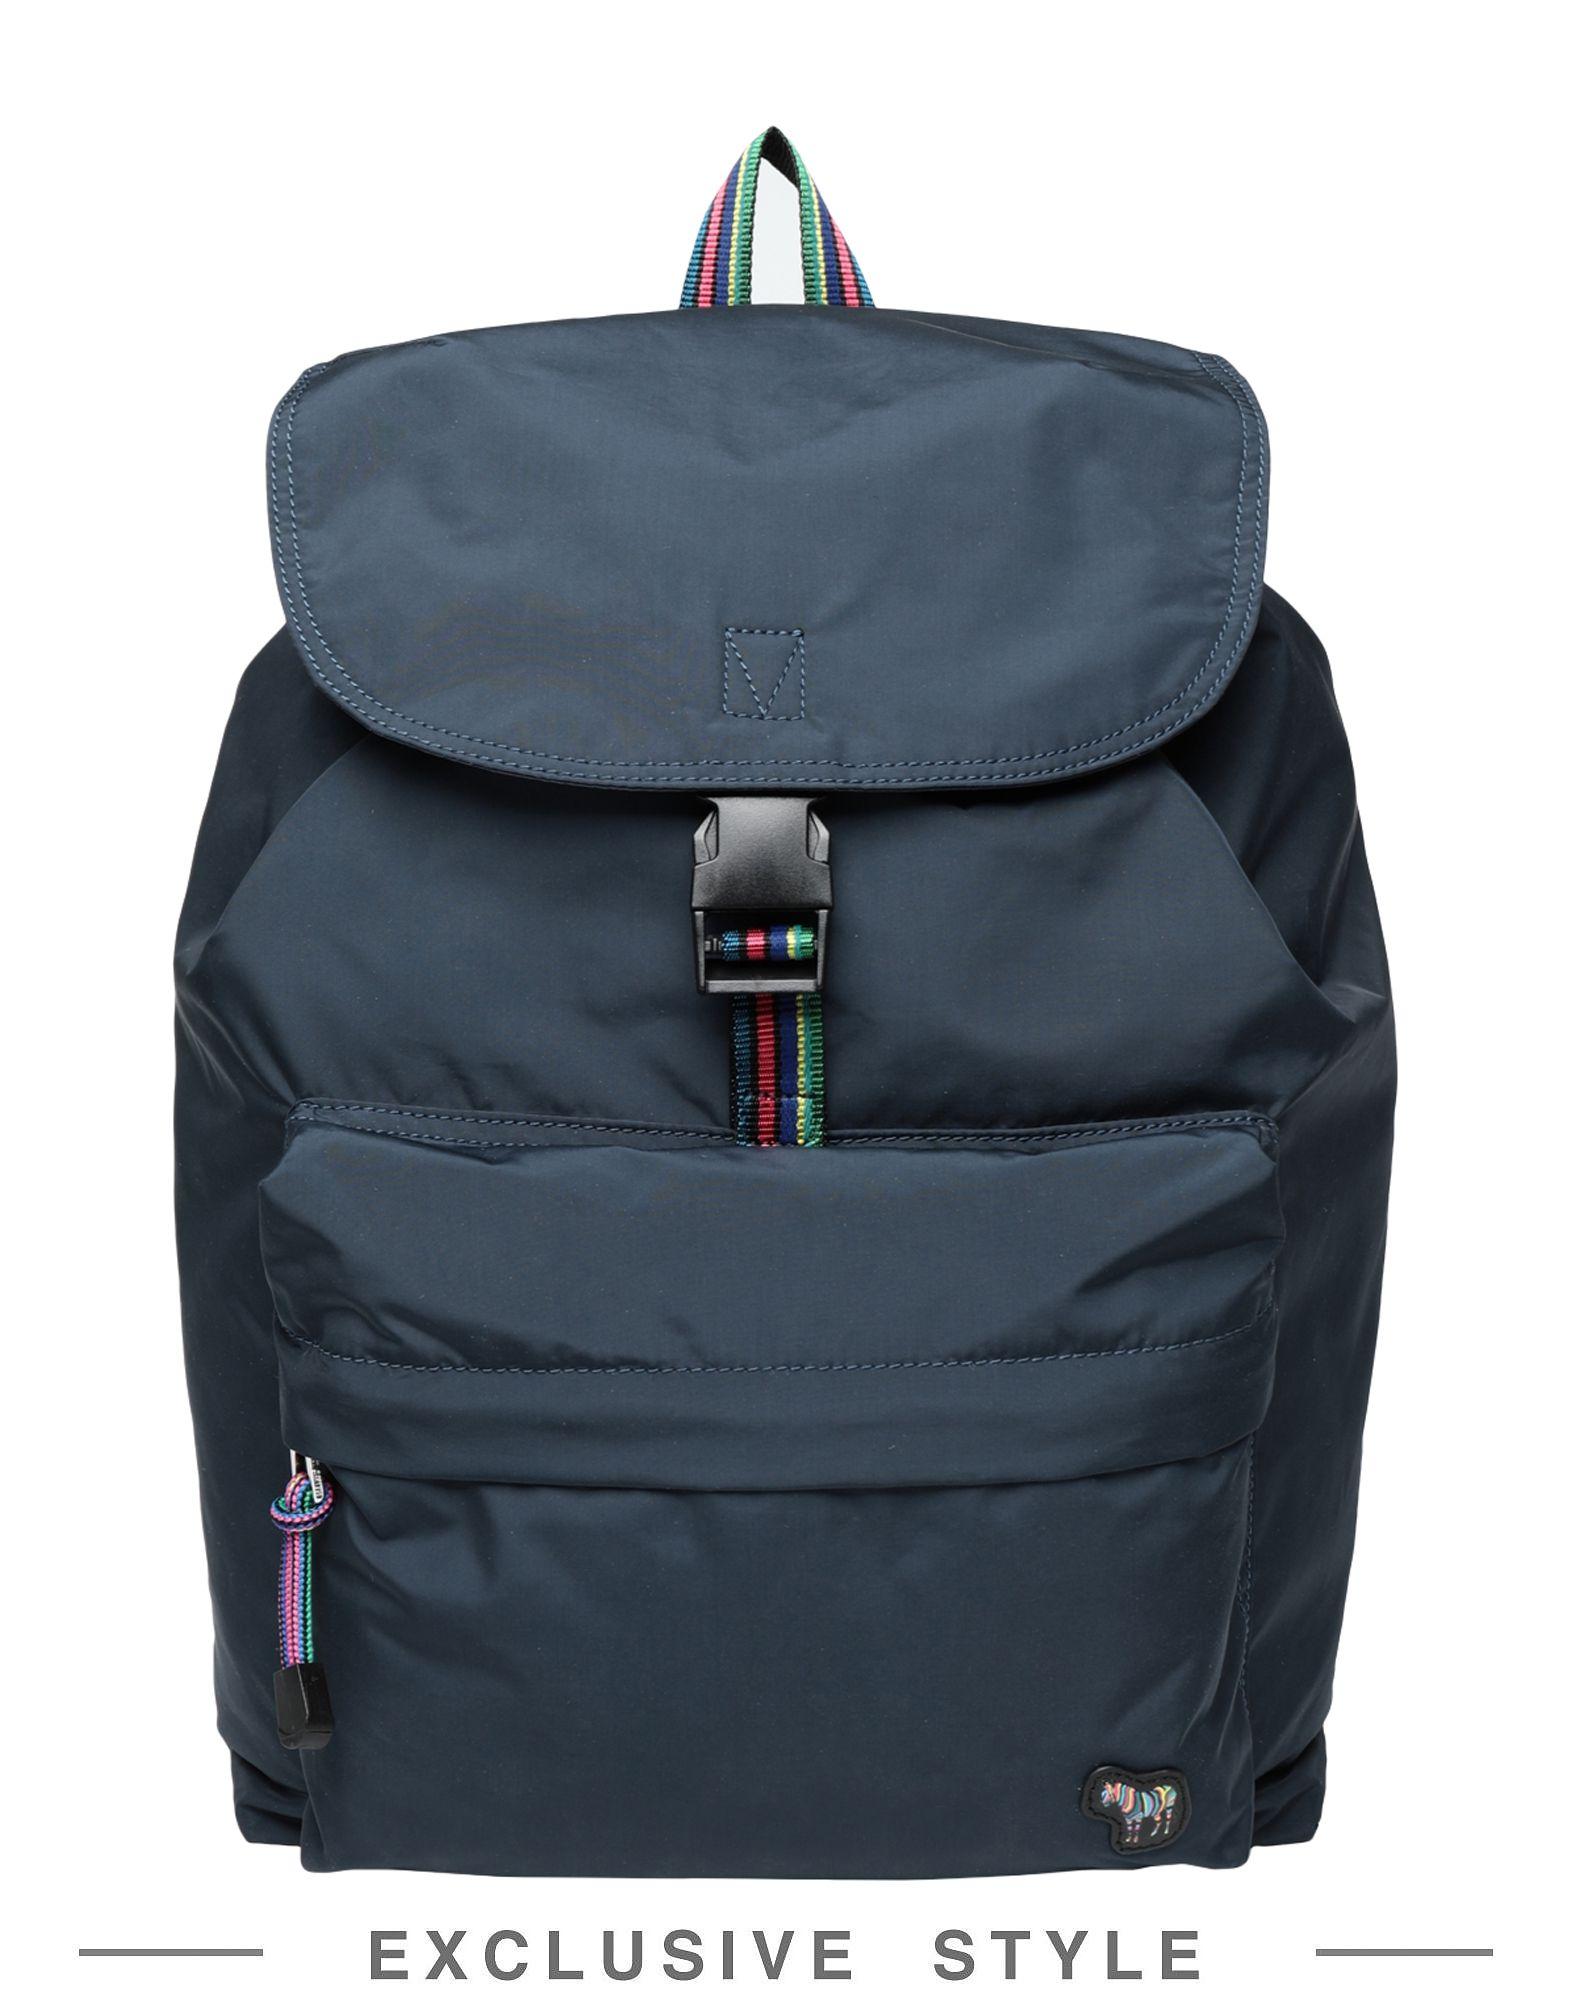 Фото - PS PAUL SMITH x YOOX Рюкзаки и сумки на пояс paul smith деловые сумки